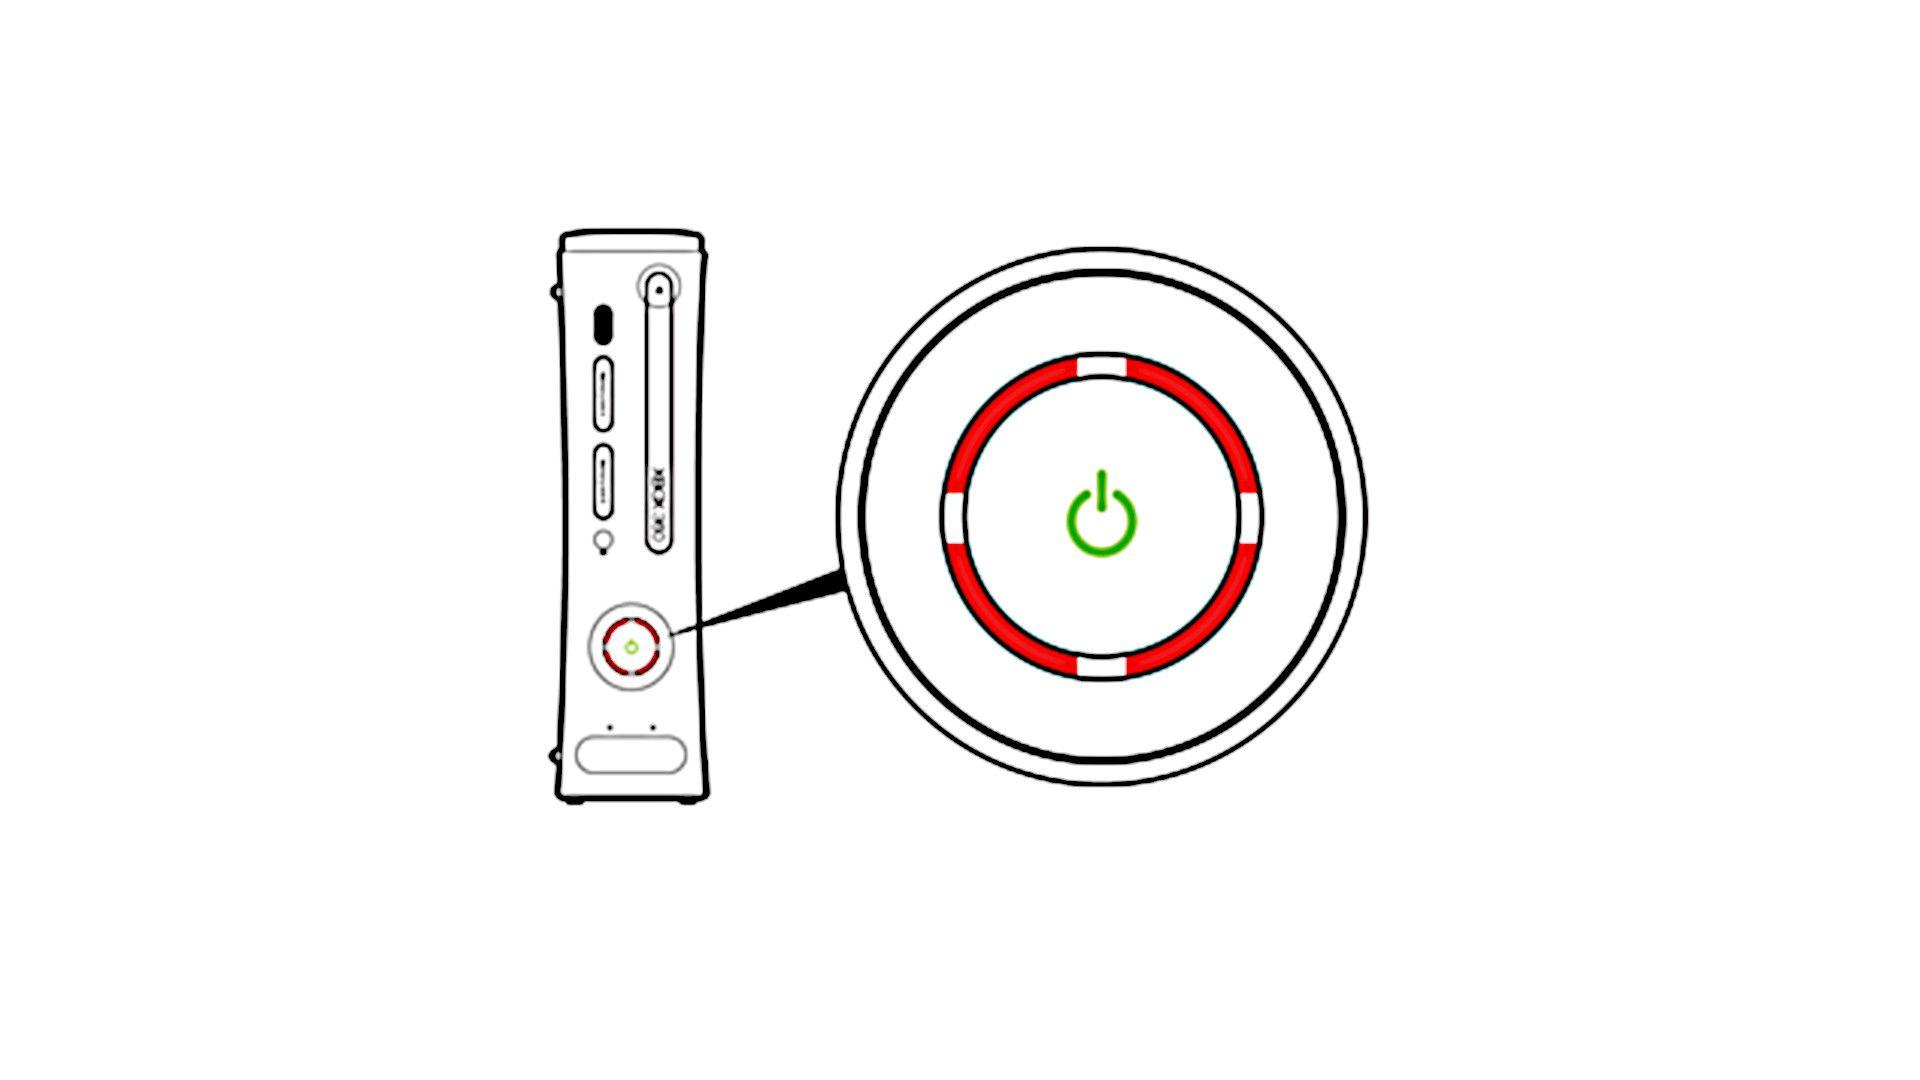 Xbox 360 with four red LEDs illuminated